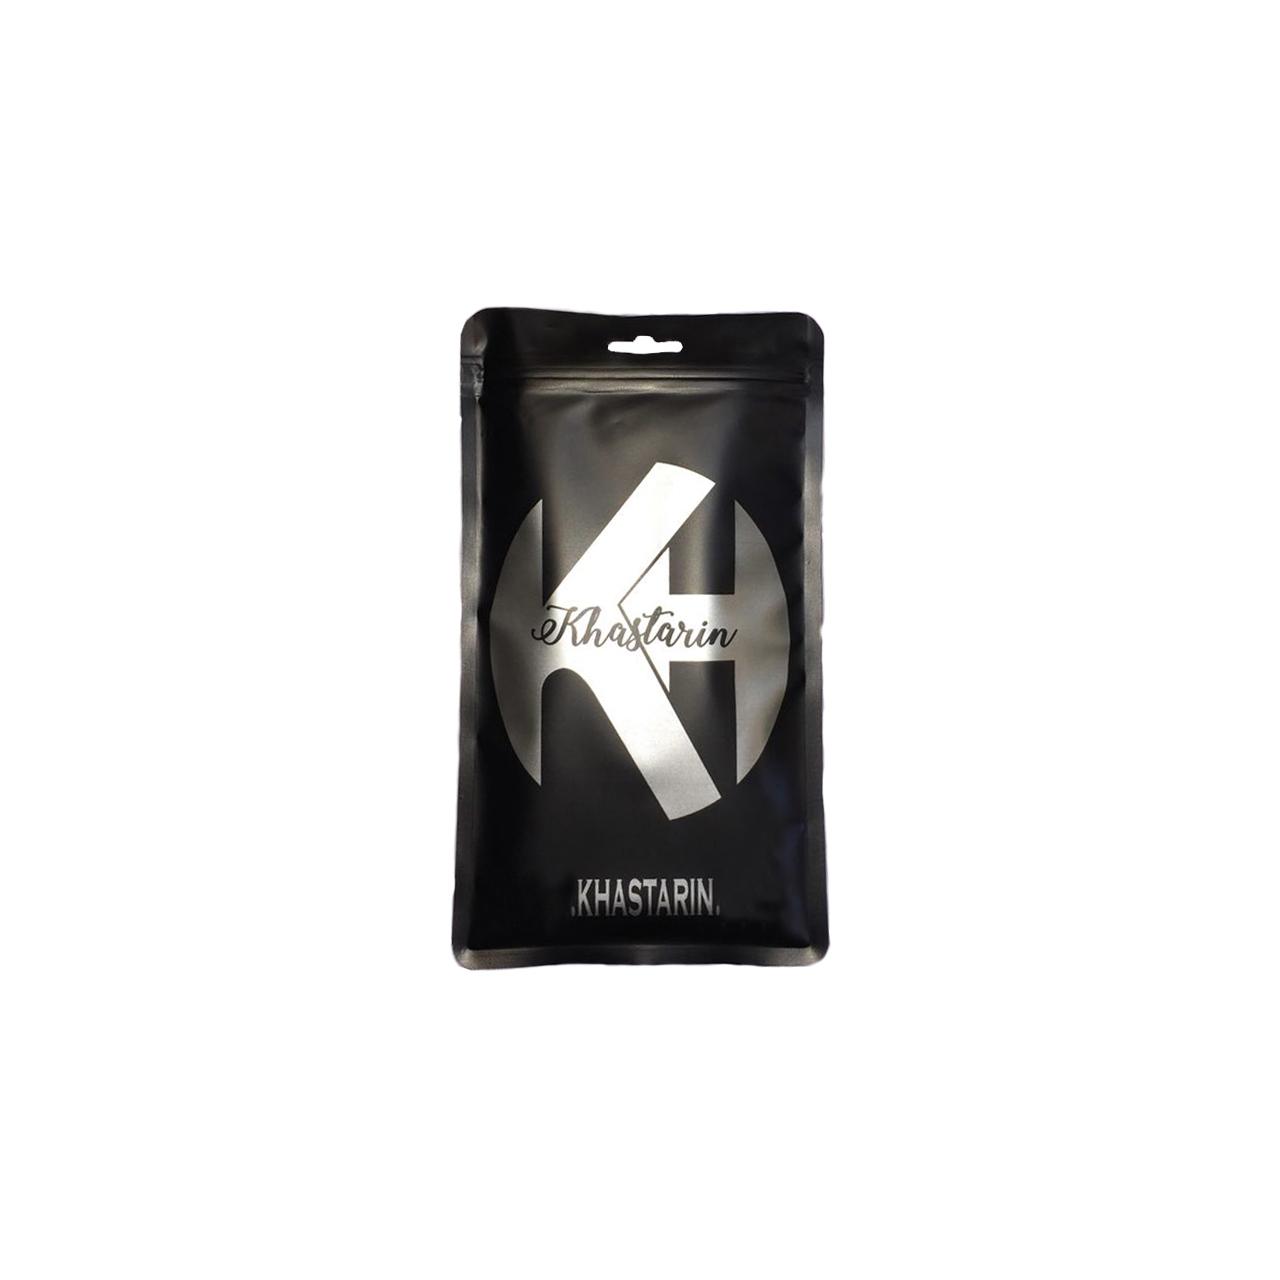 کاور کی اچ کد C19 مناسب برای گوشی موبایل آنر 7X